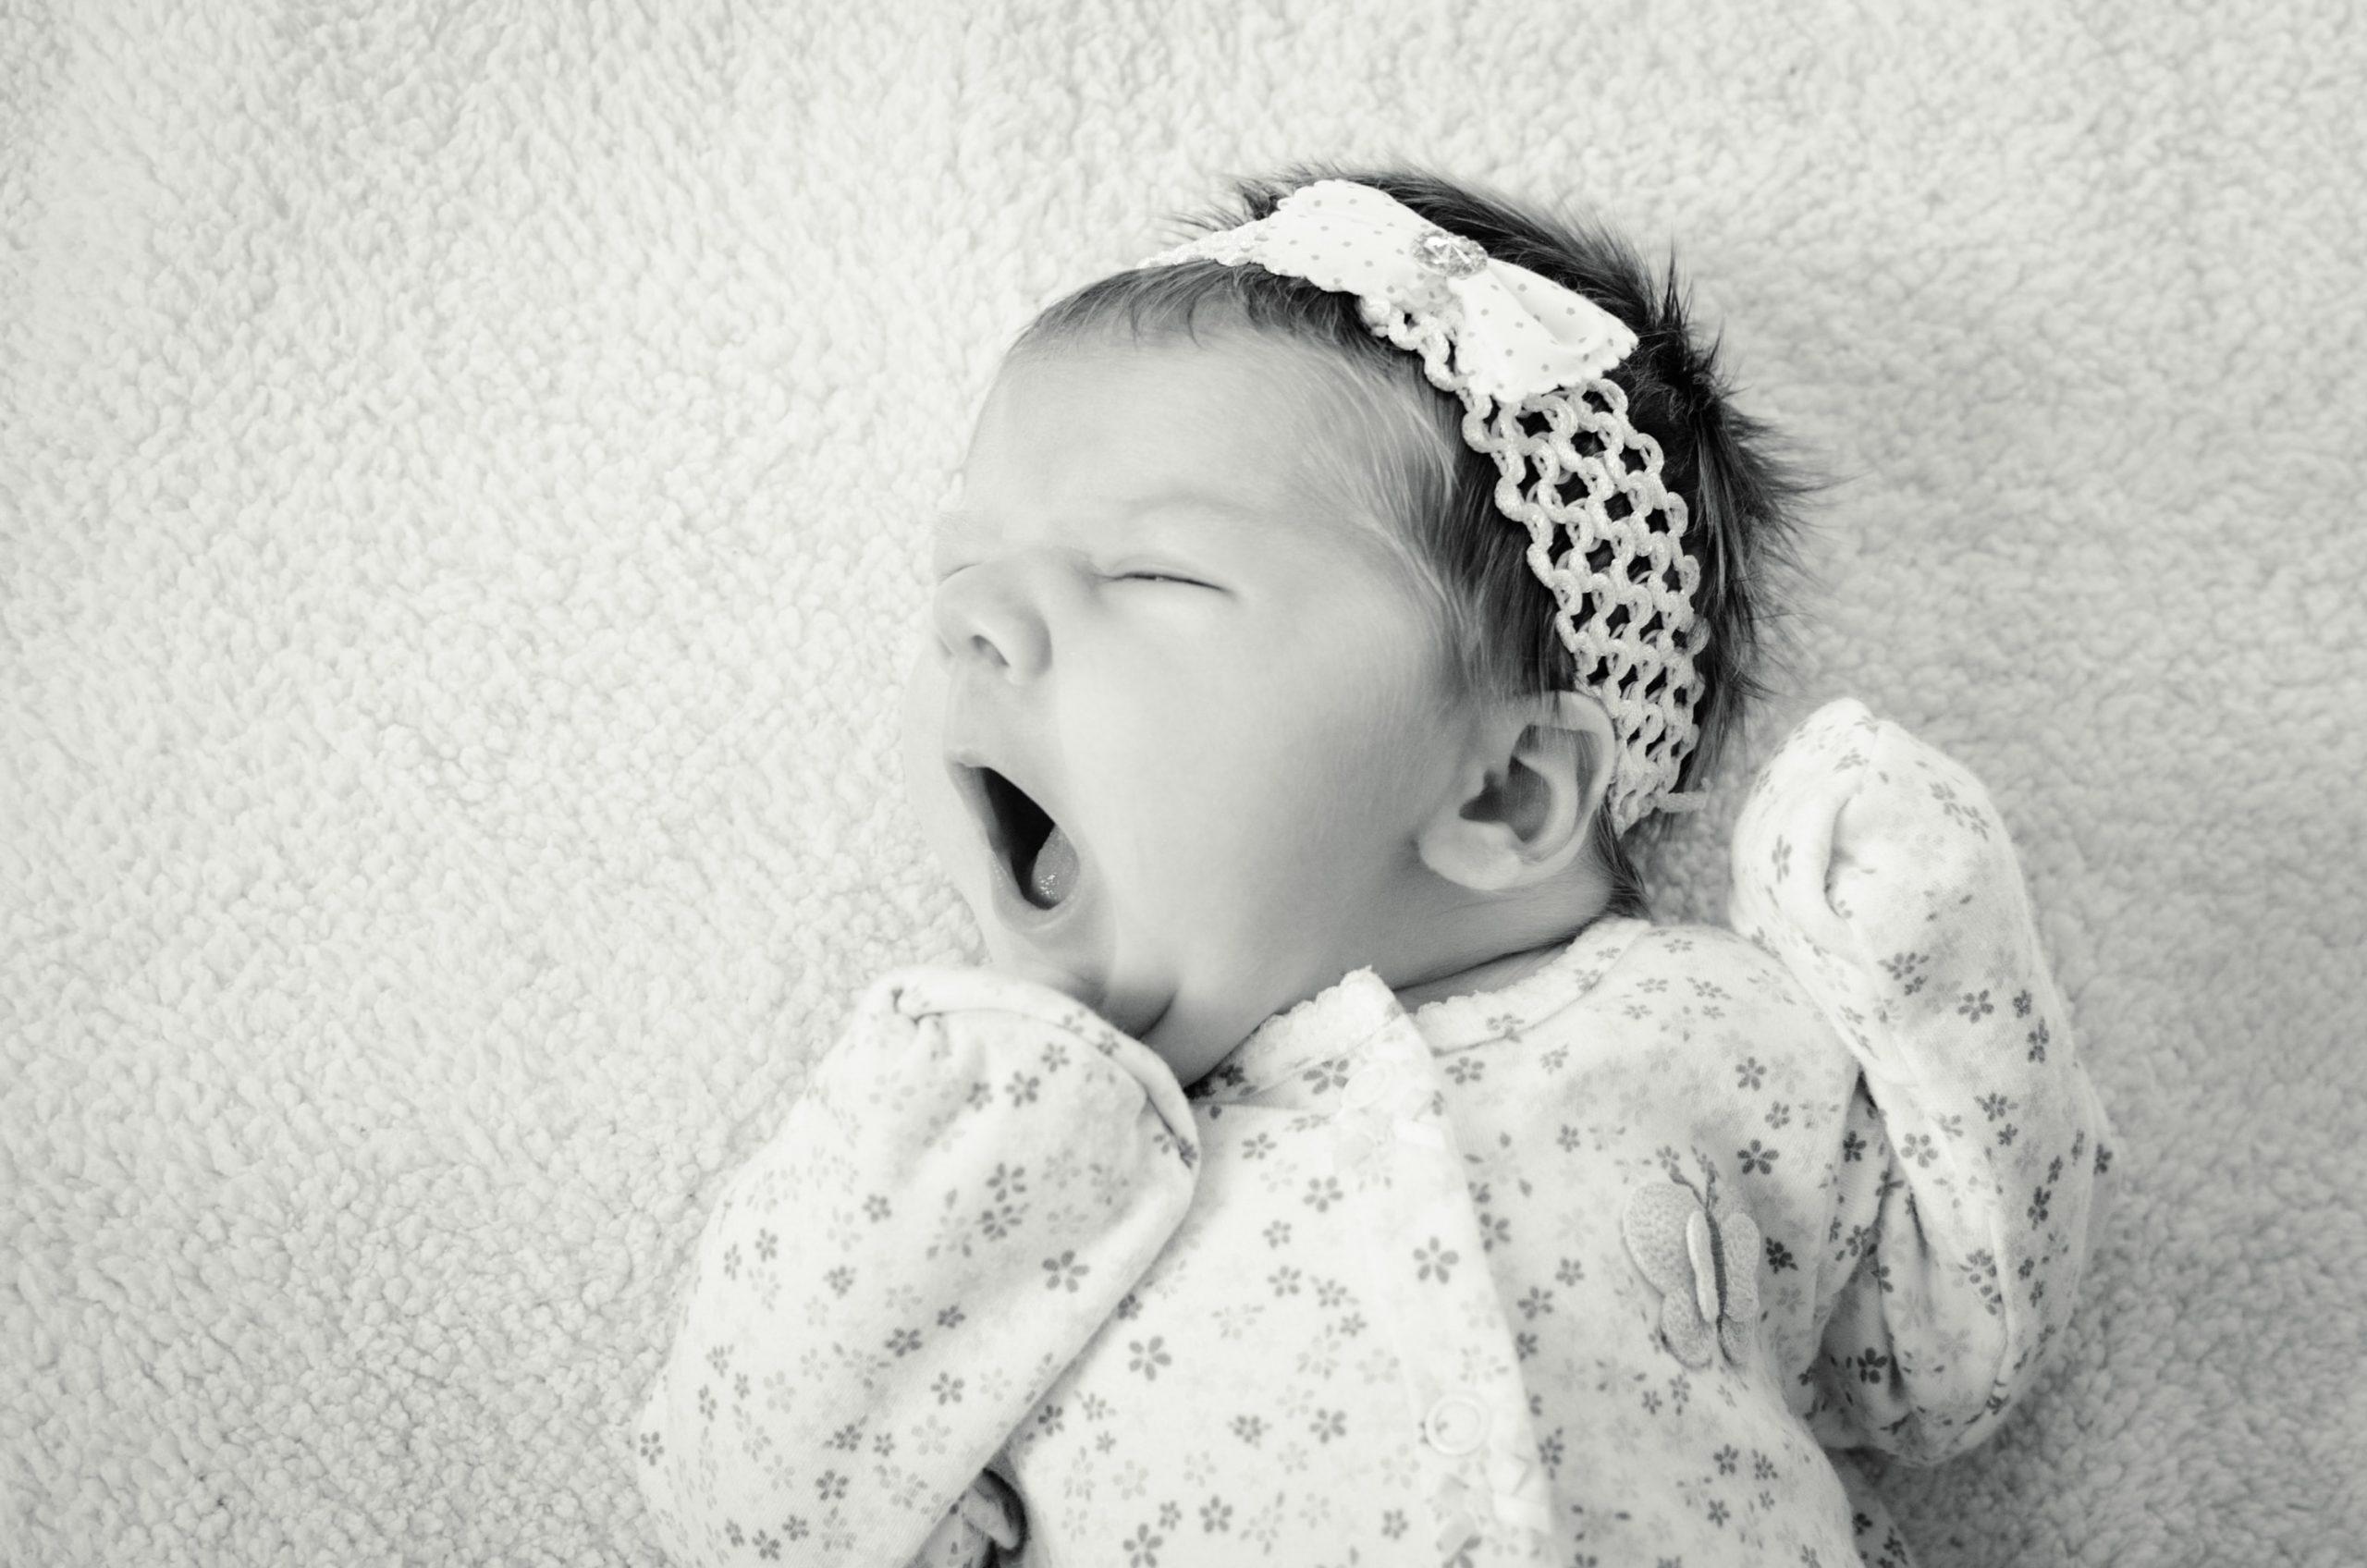 Photo of yawning baby girl laying on blanket